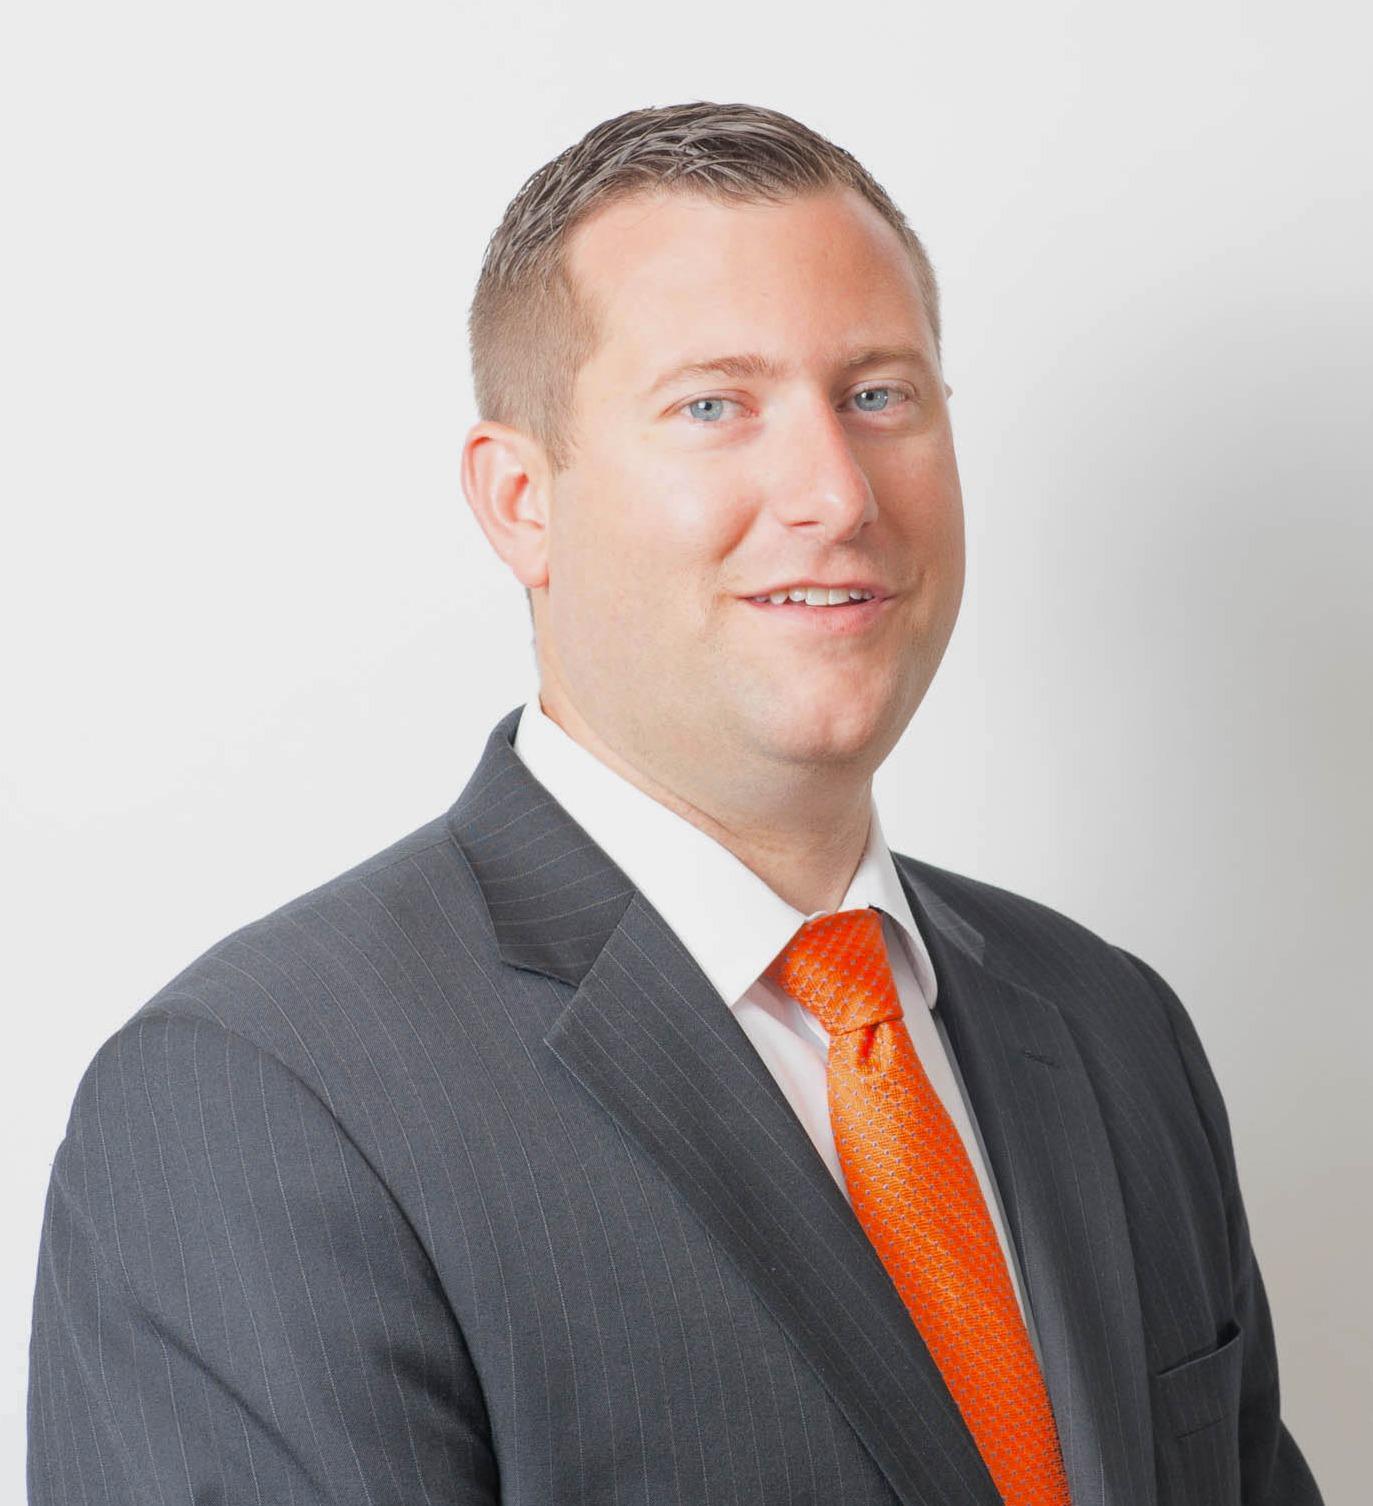 Michael J  DeVries | Chicago, IL | Morgan Stanley Wealth